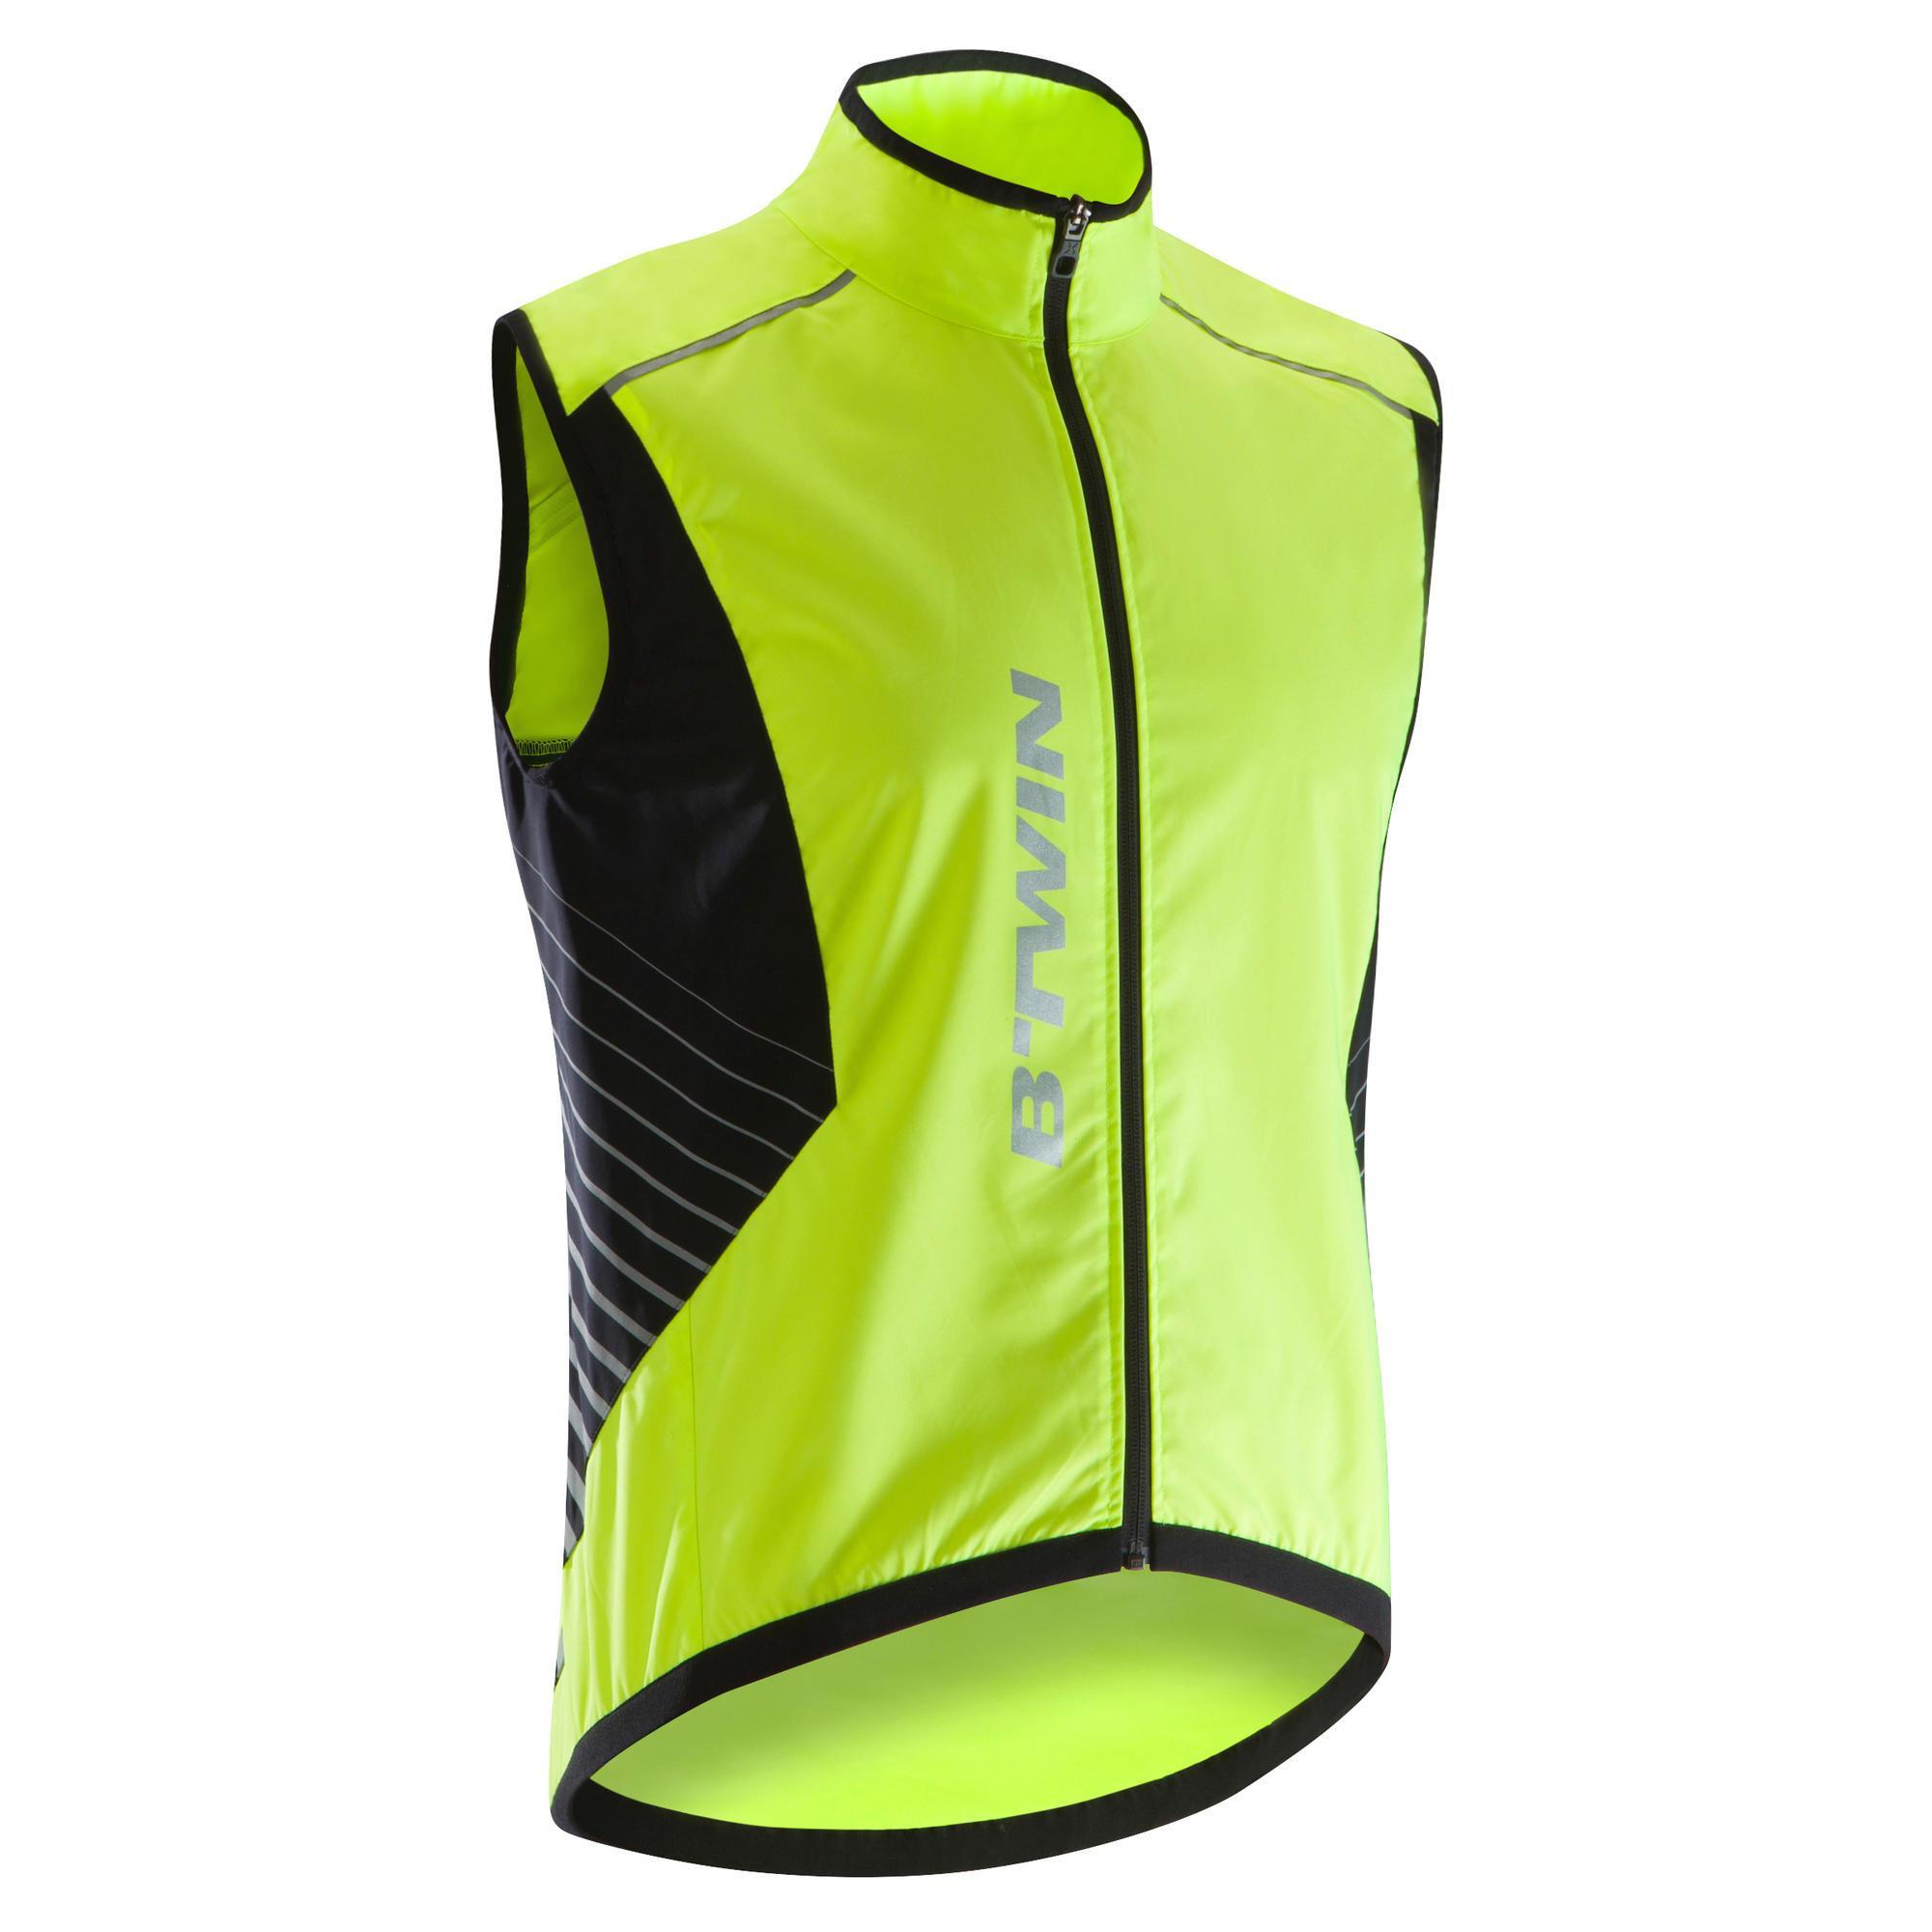 Fahrradweste 500 Herren neongelb | Sportbekleidung > Sportwesten > Fahrradwesten | Gelb - Grau | B´twin